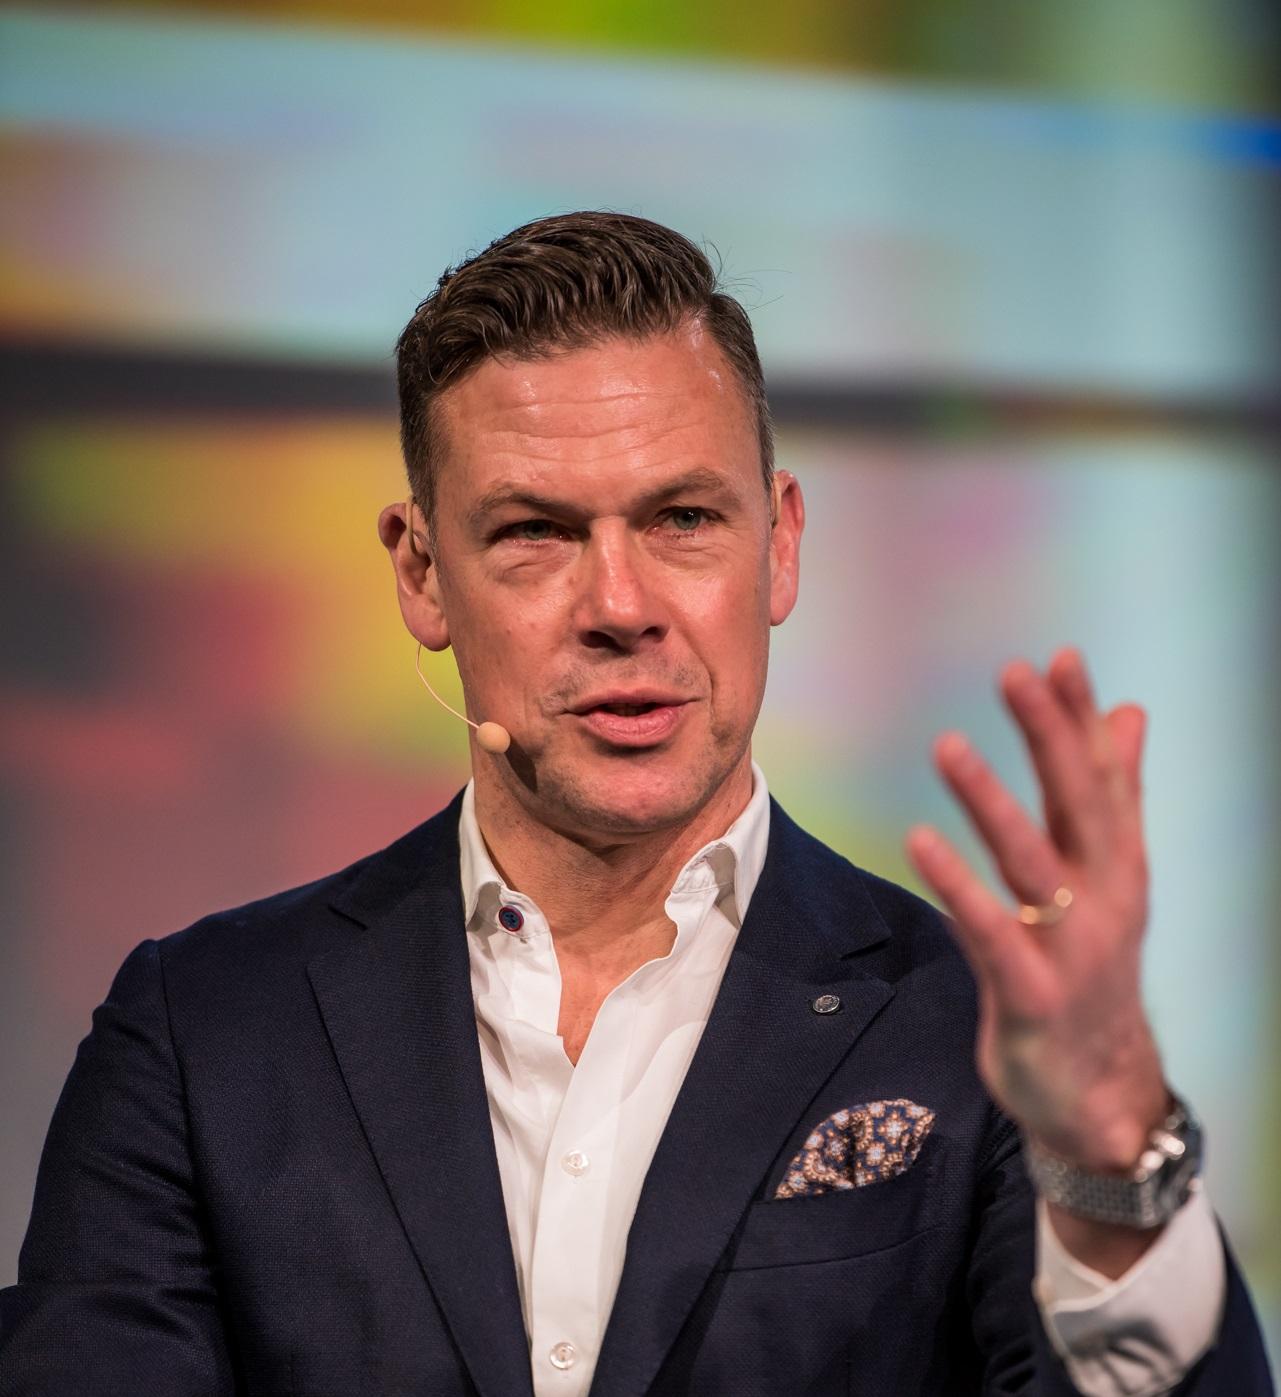 Keynote Speaker Erik Meijer live